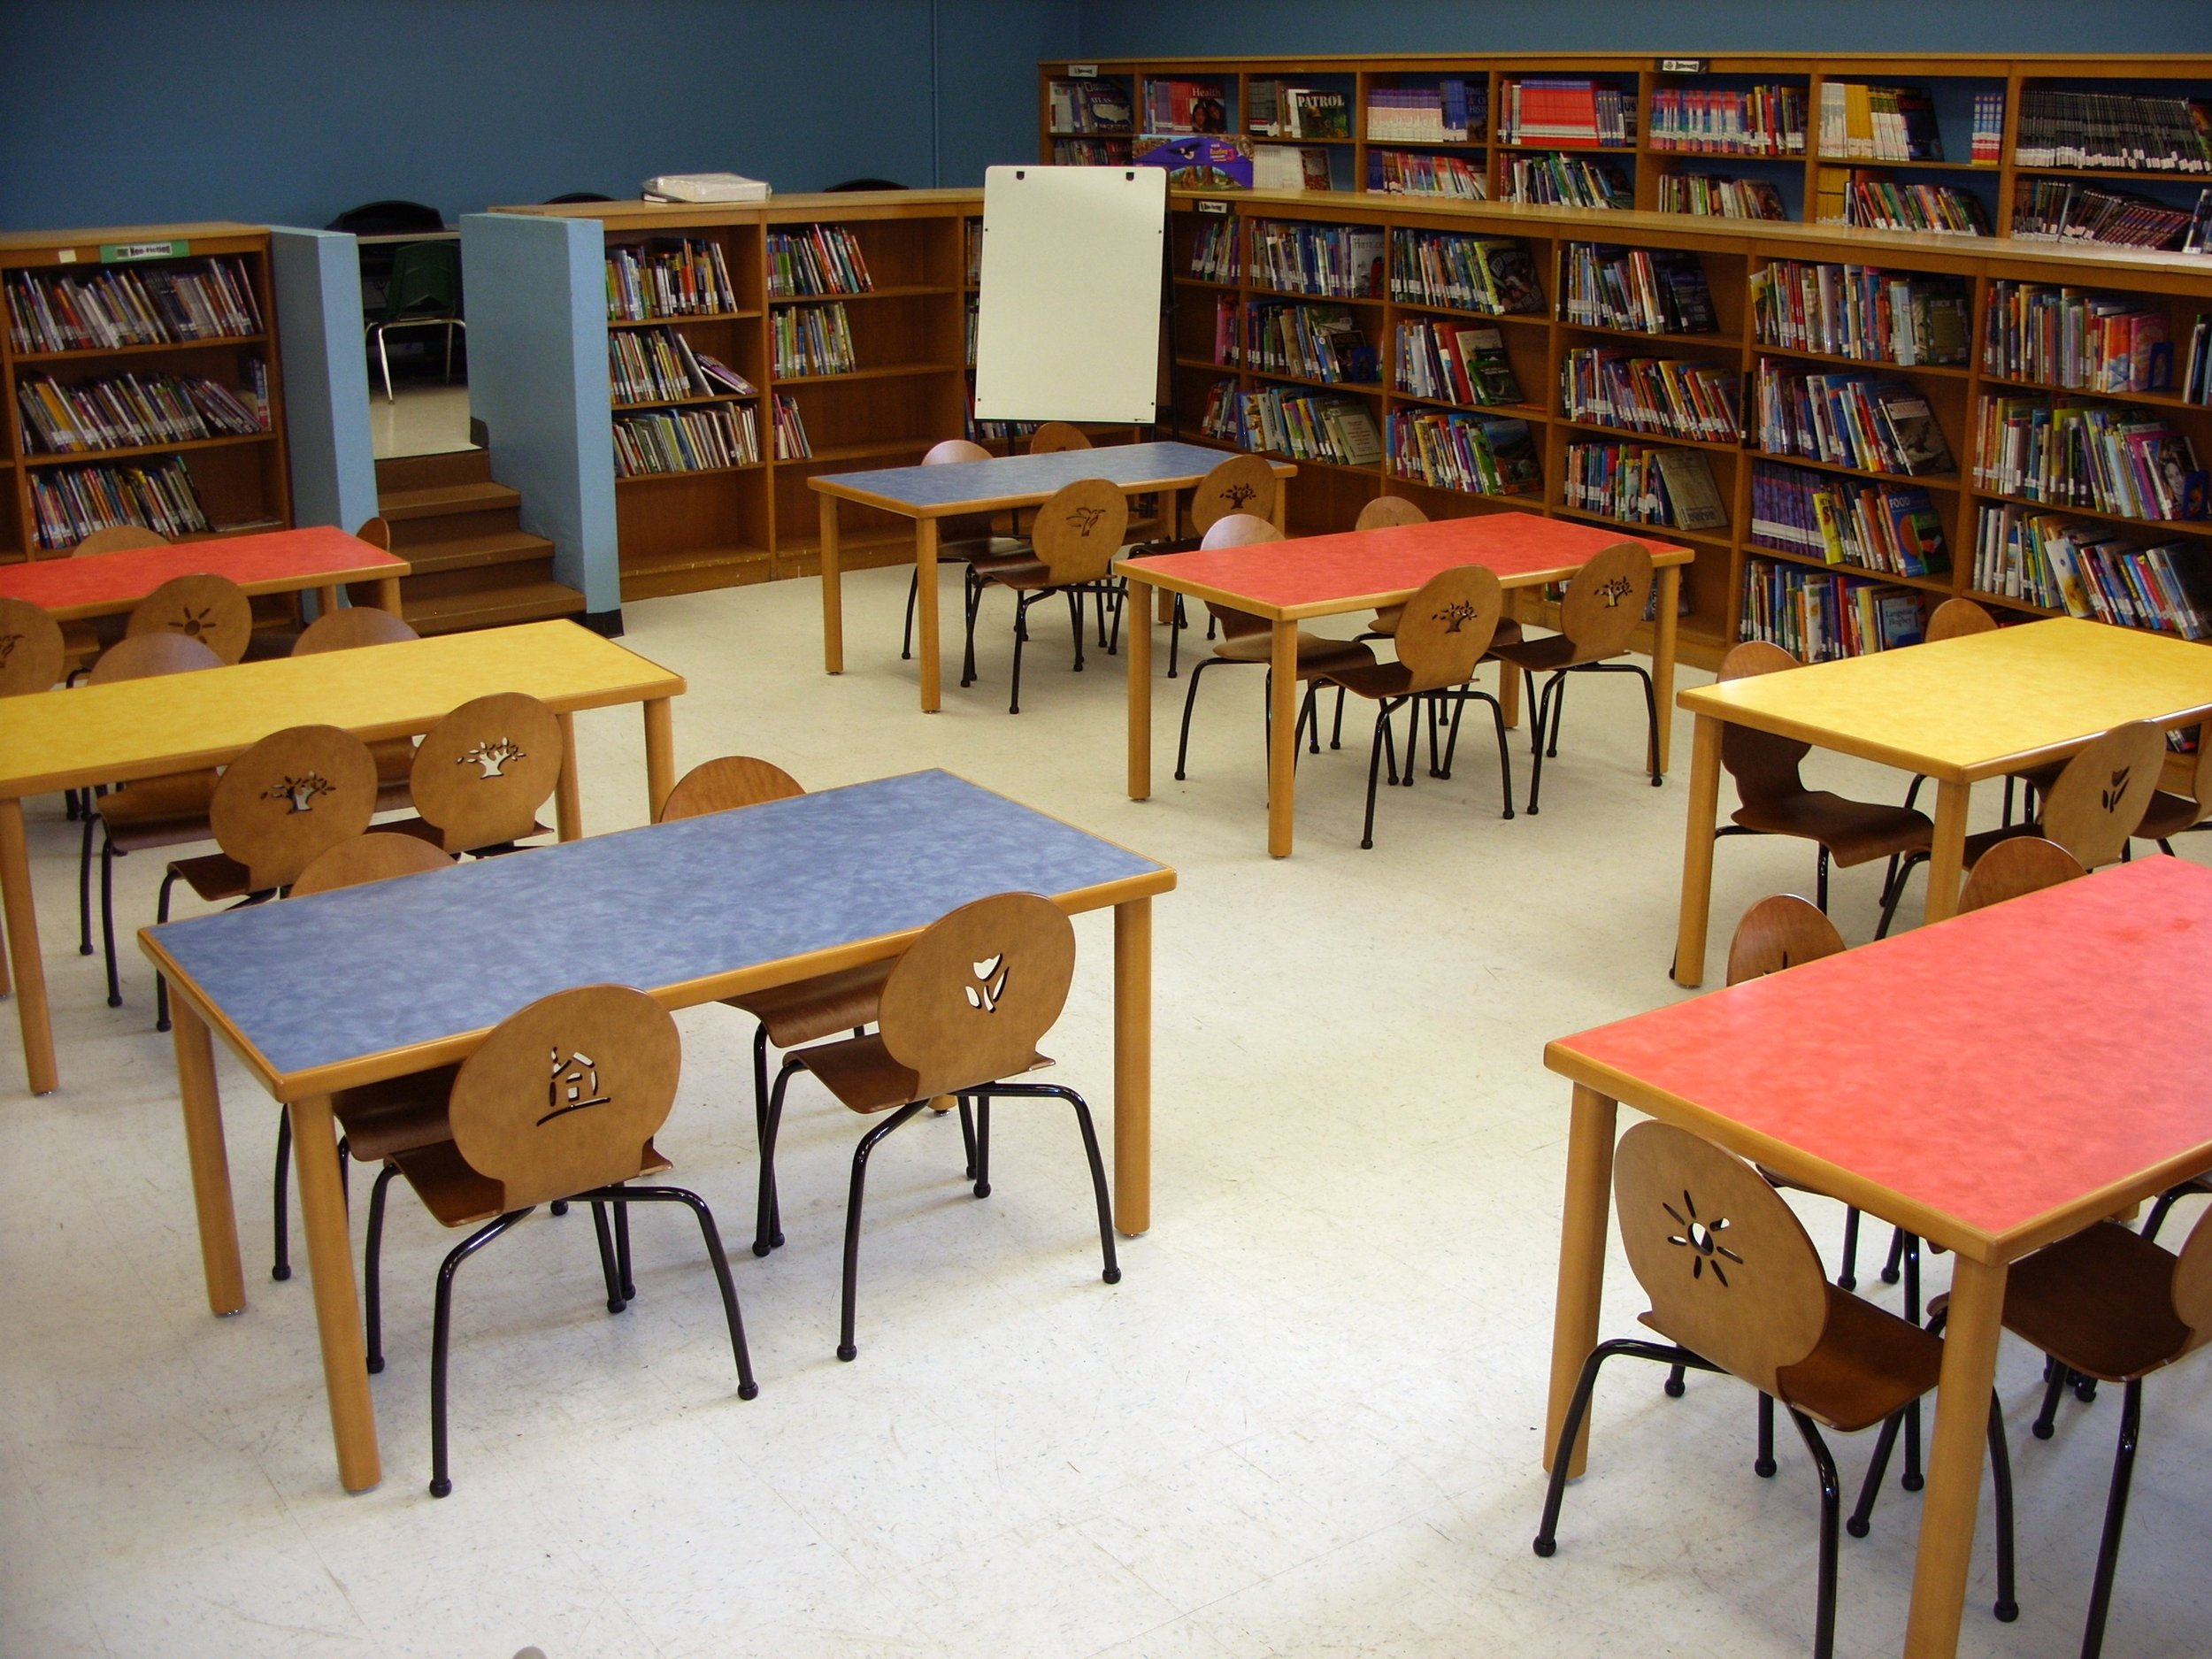 McDonough 32 Elementary School